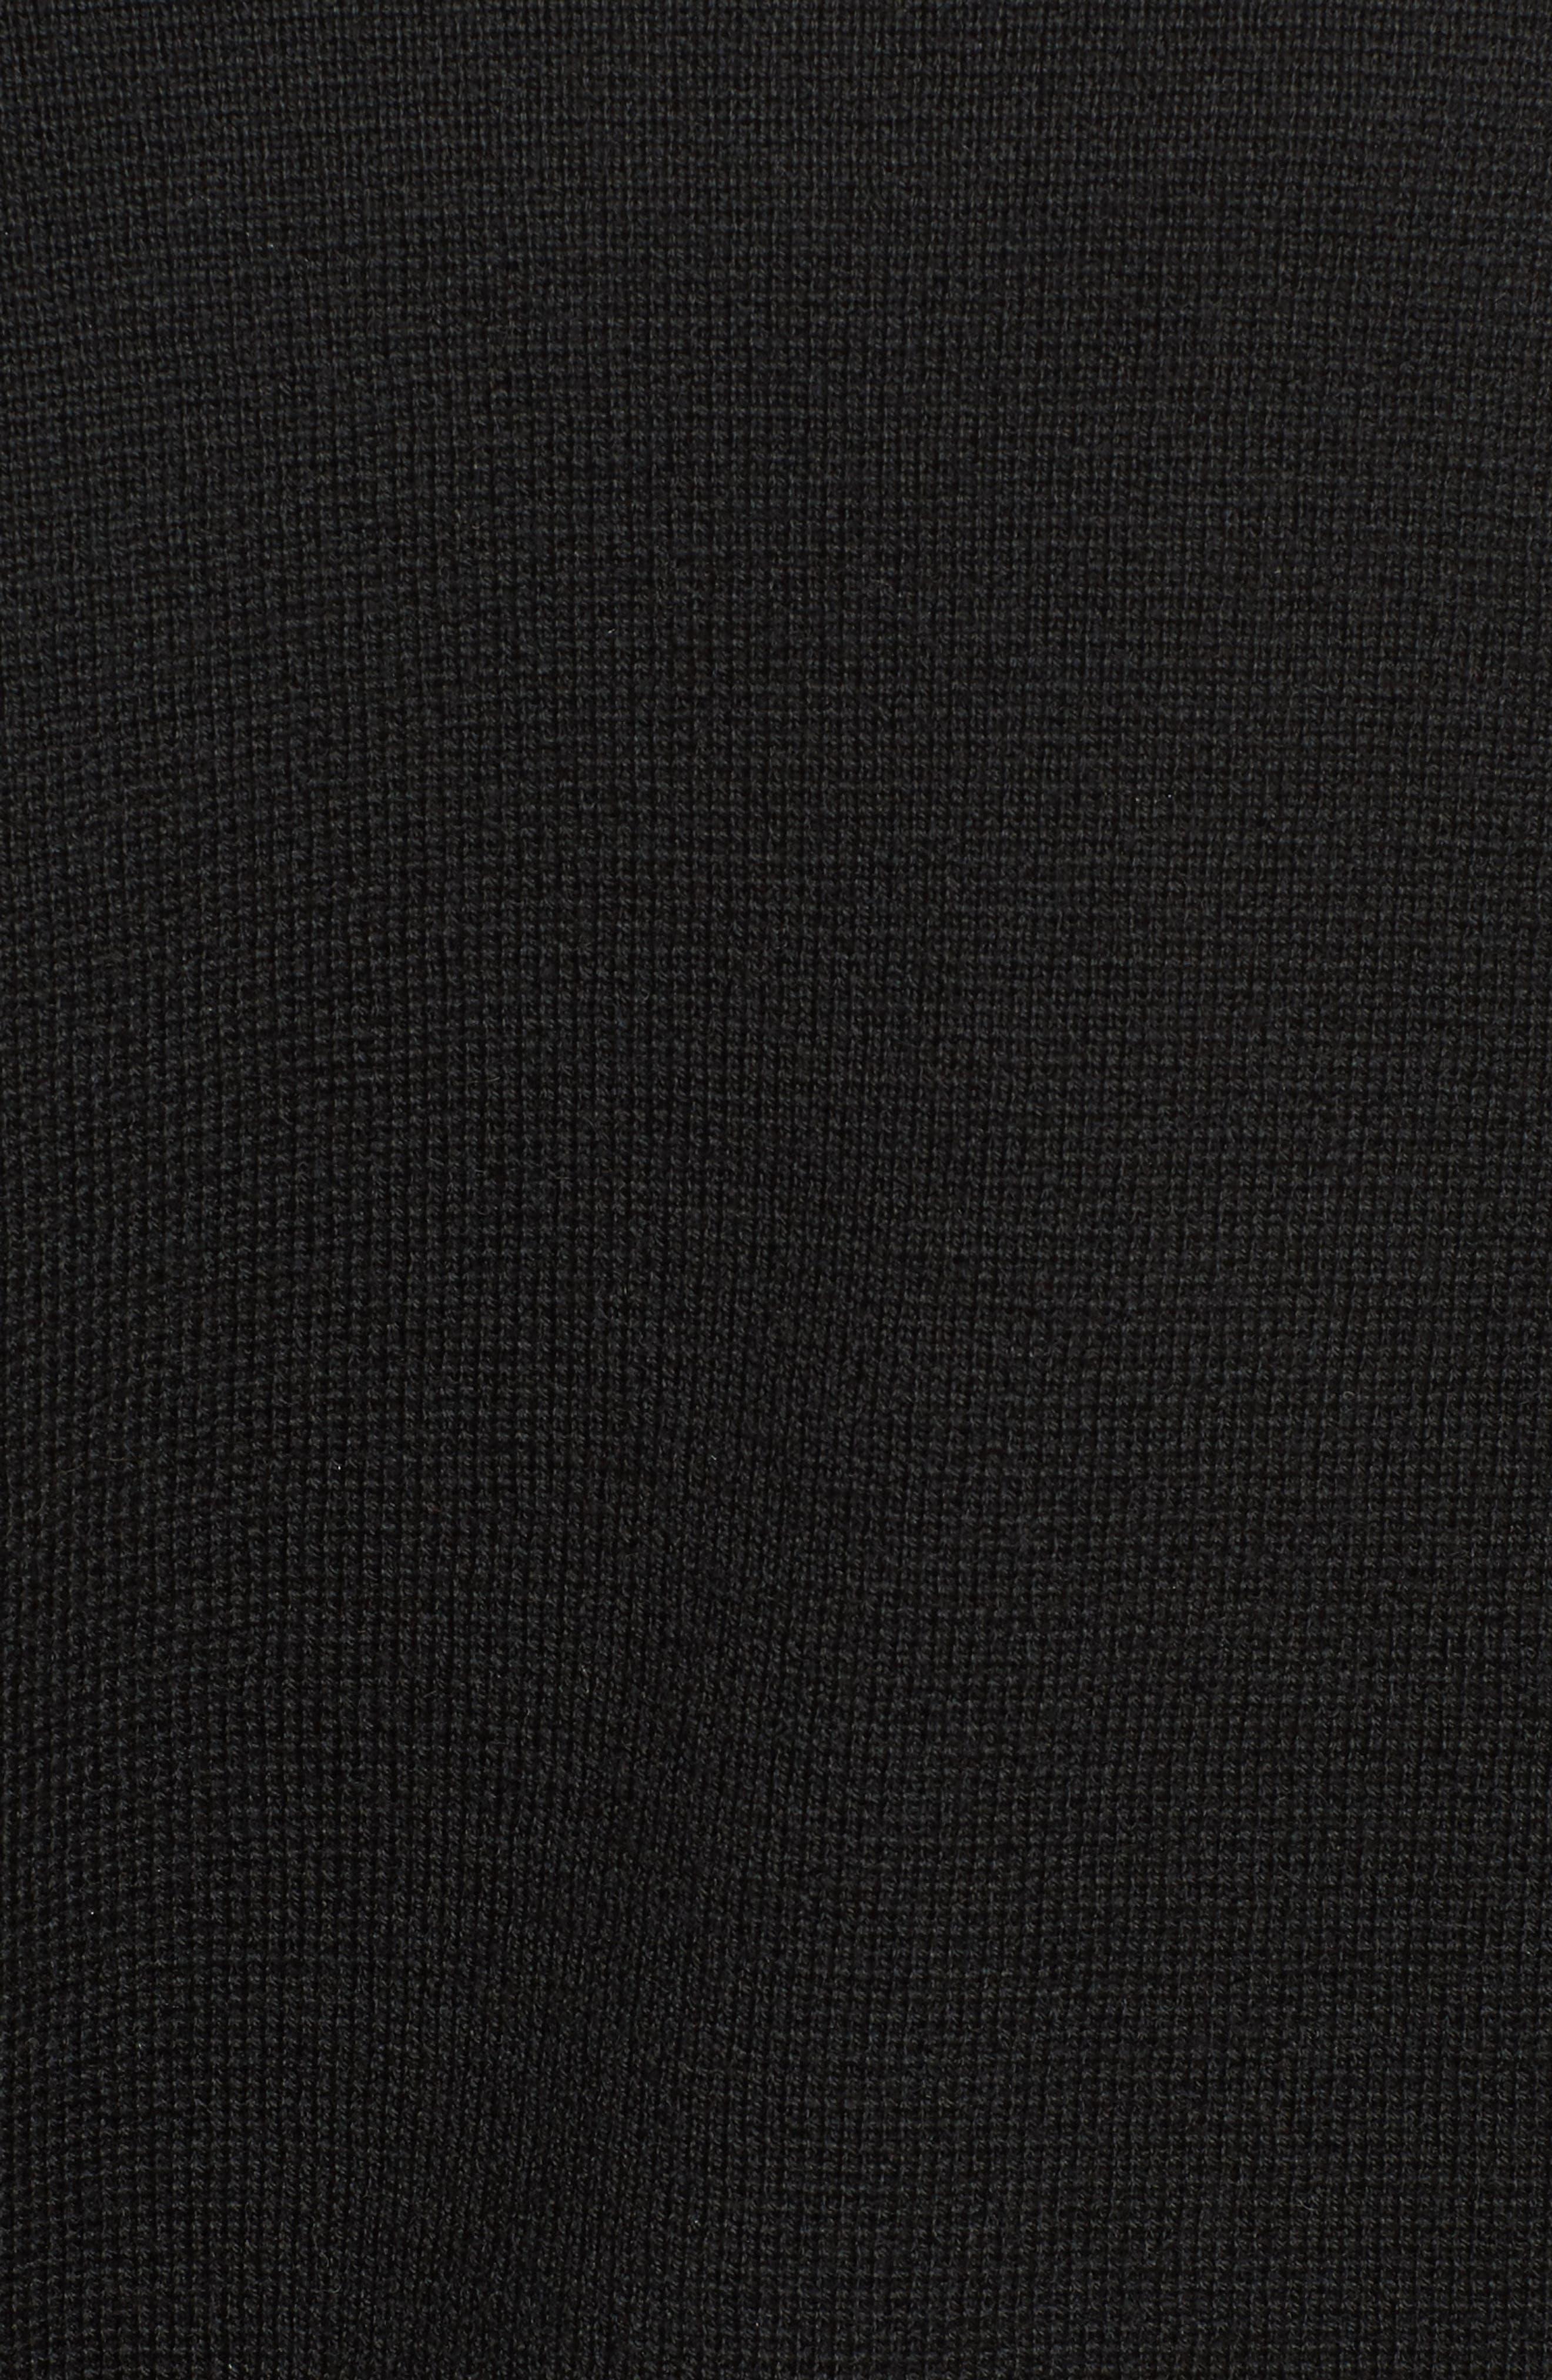 Merino Wool Knit Blazer,                             Alternate thumbnail 6, color,                             001